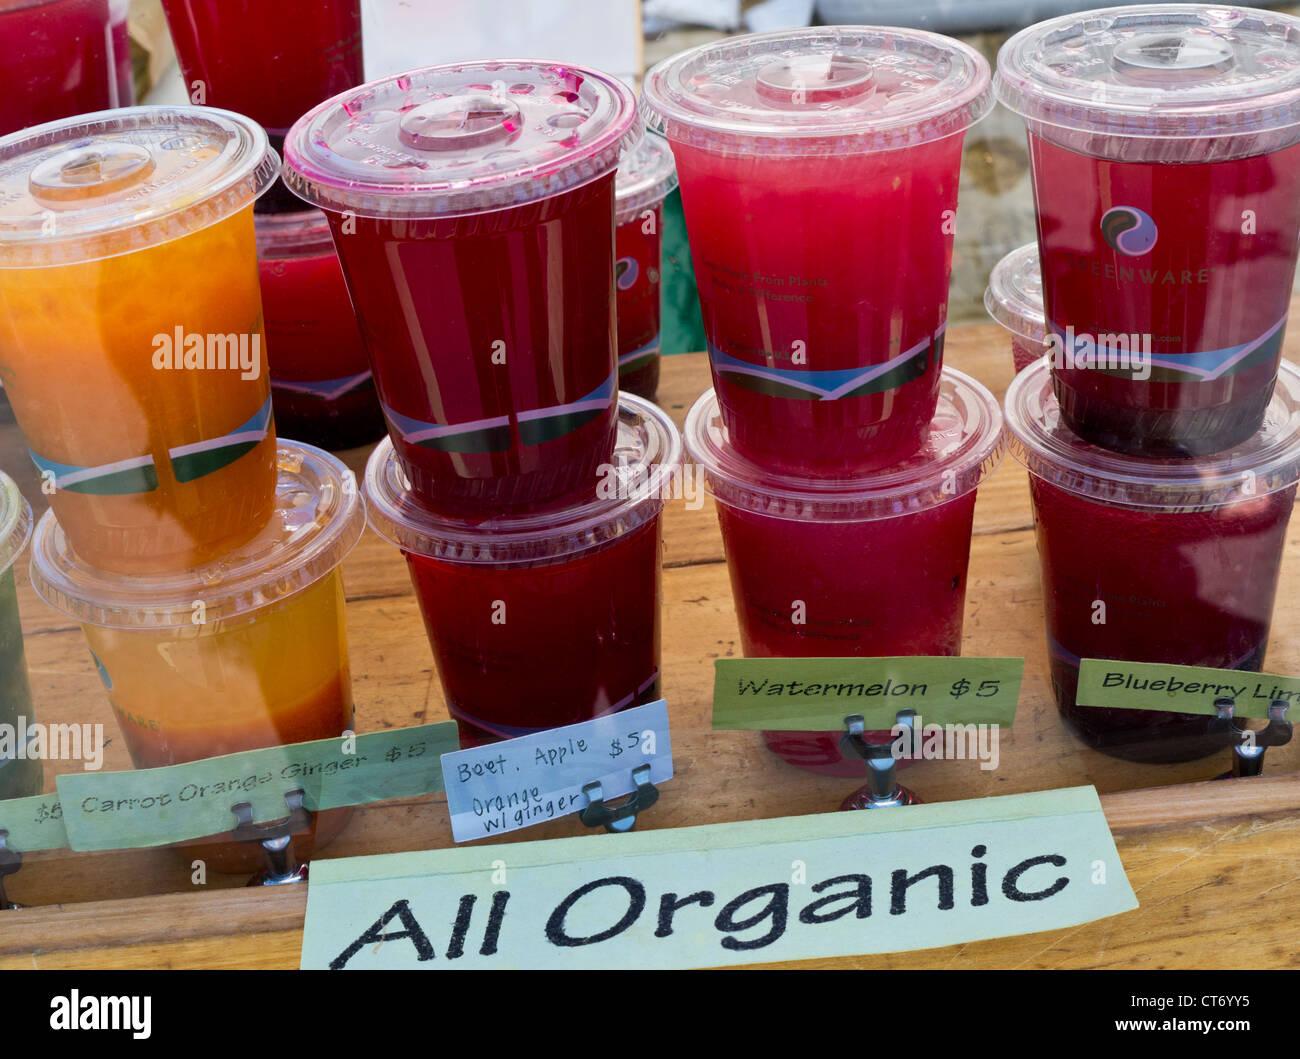 Organic juices on sale at Farmers Market Embarcadero San Francisco California USA - Stock Image